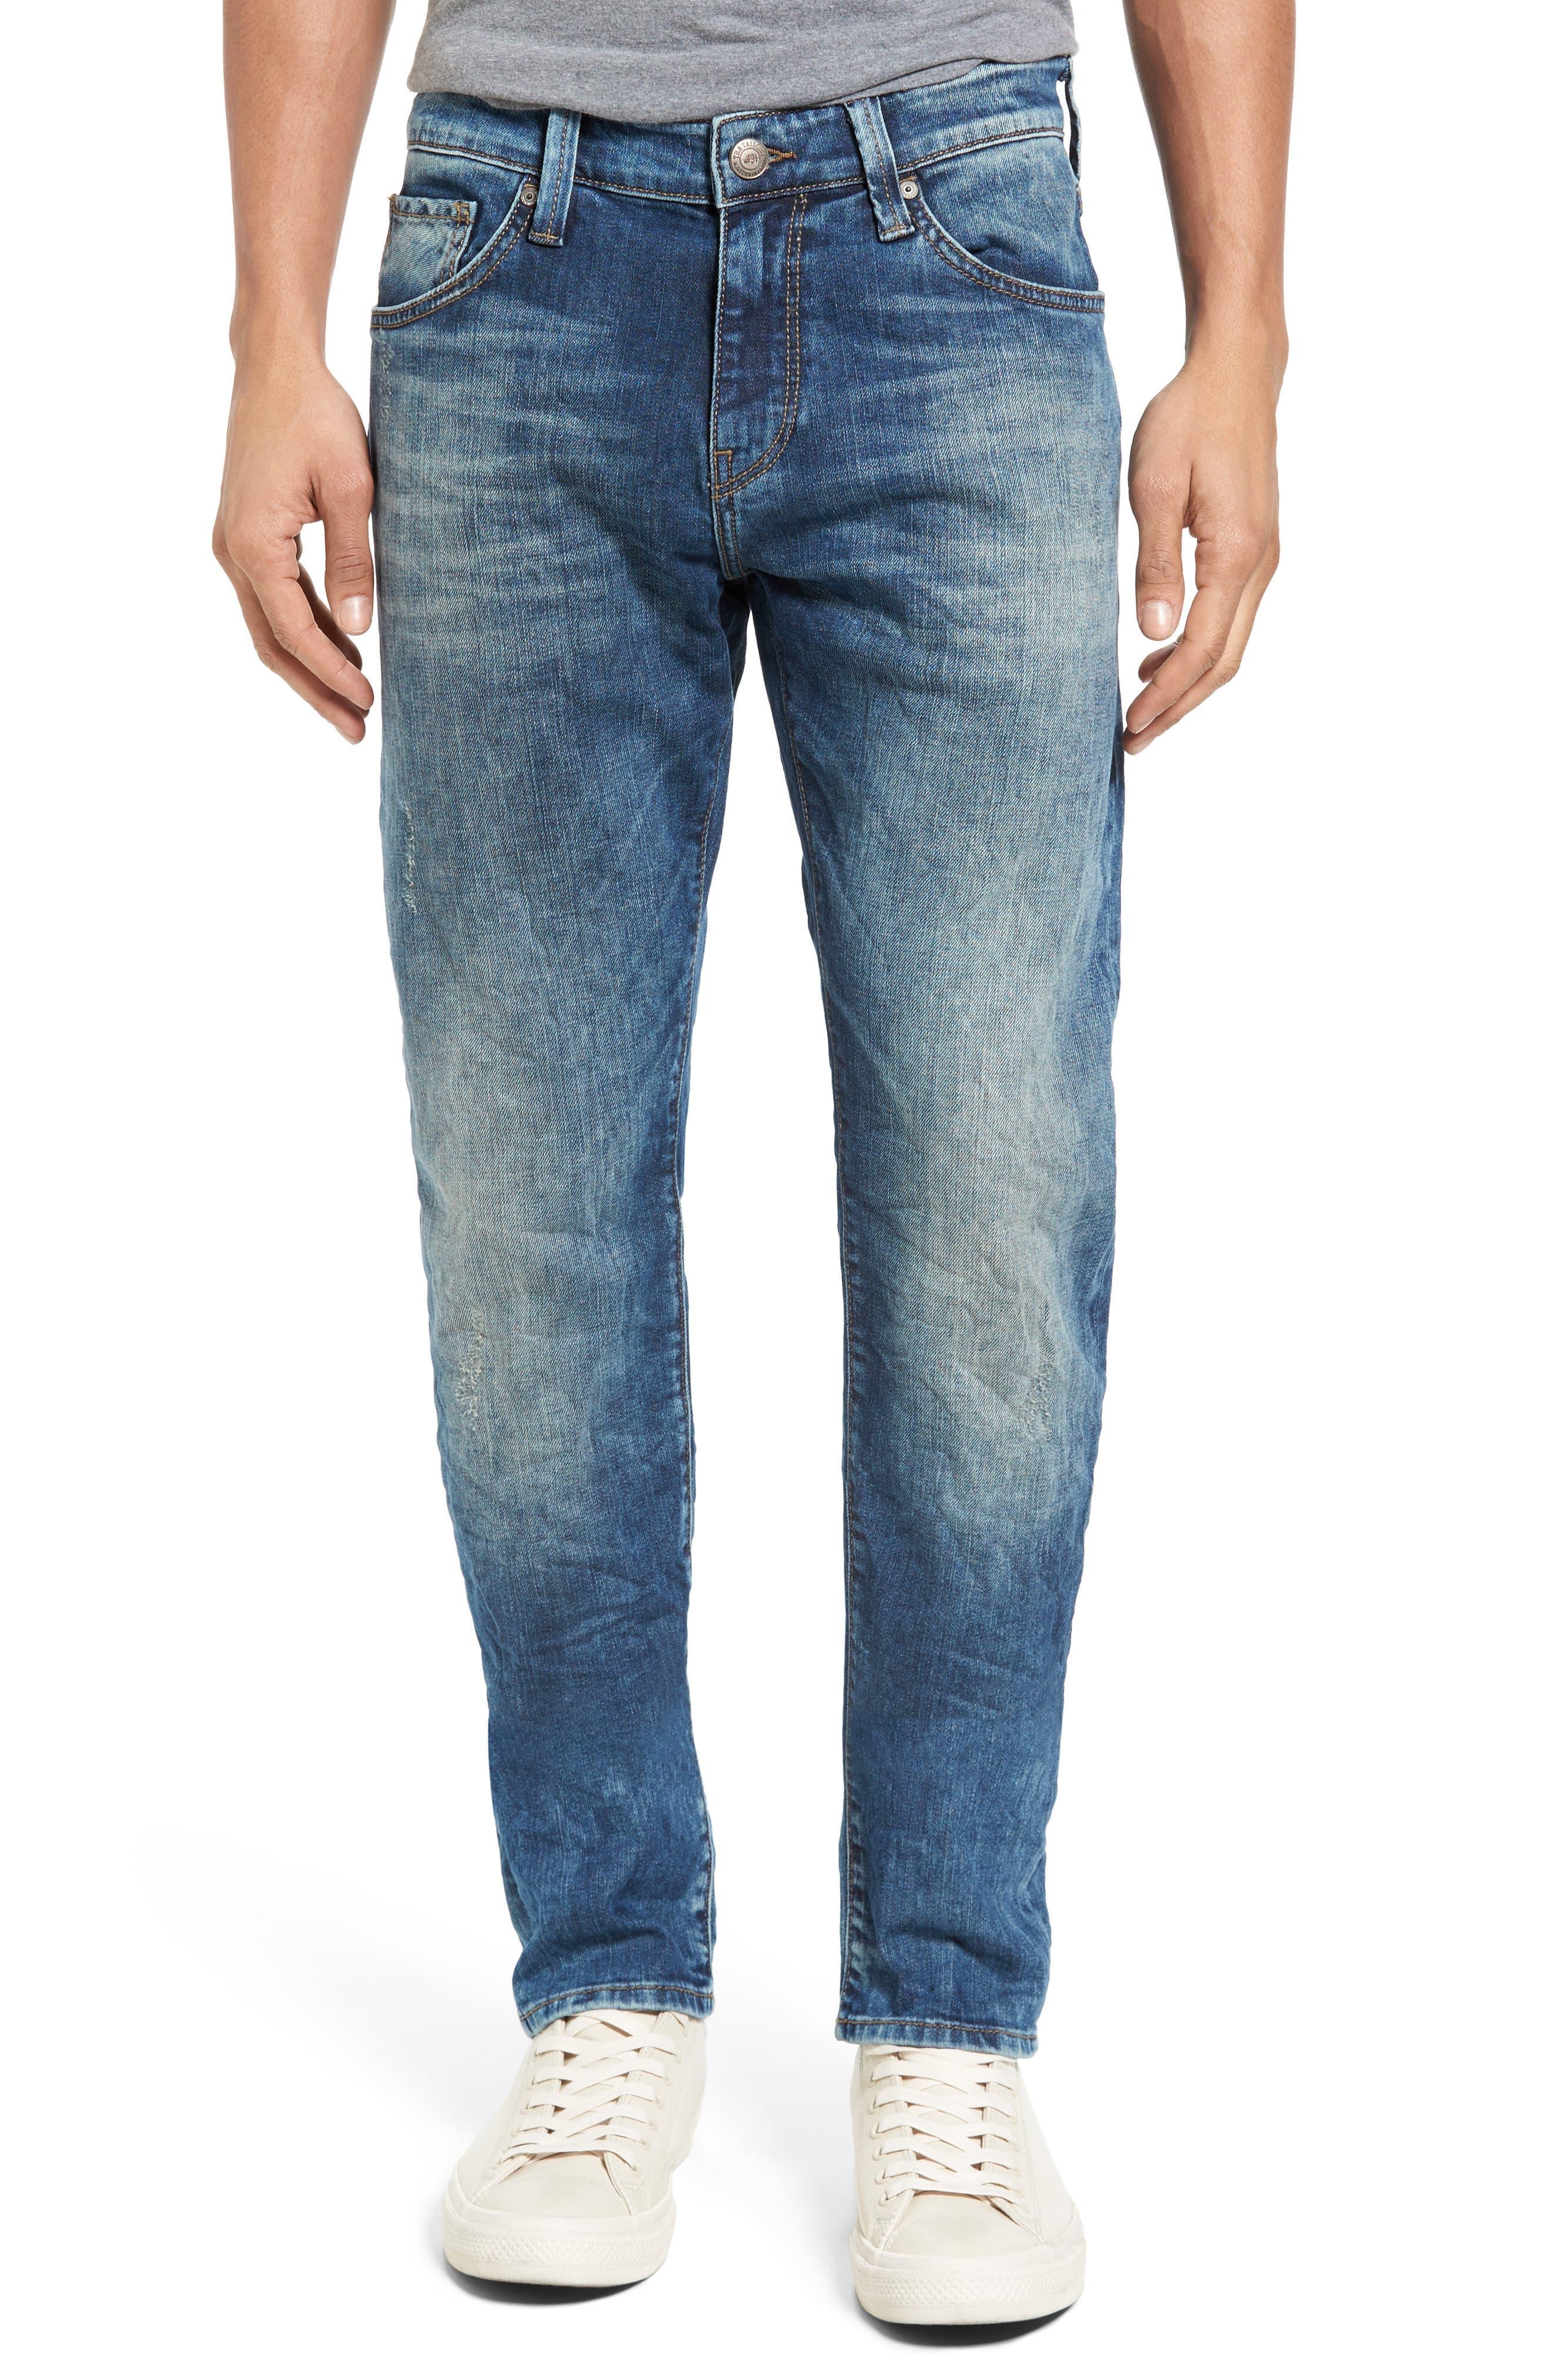 Jake Easy Slim Fit Jeans,                             Main thumbnail 1, color,                             Random Extreme Vintage